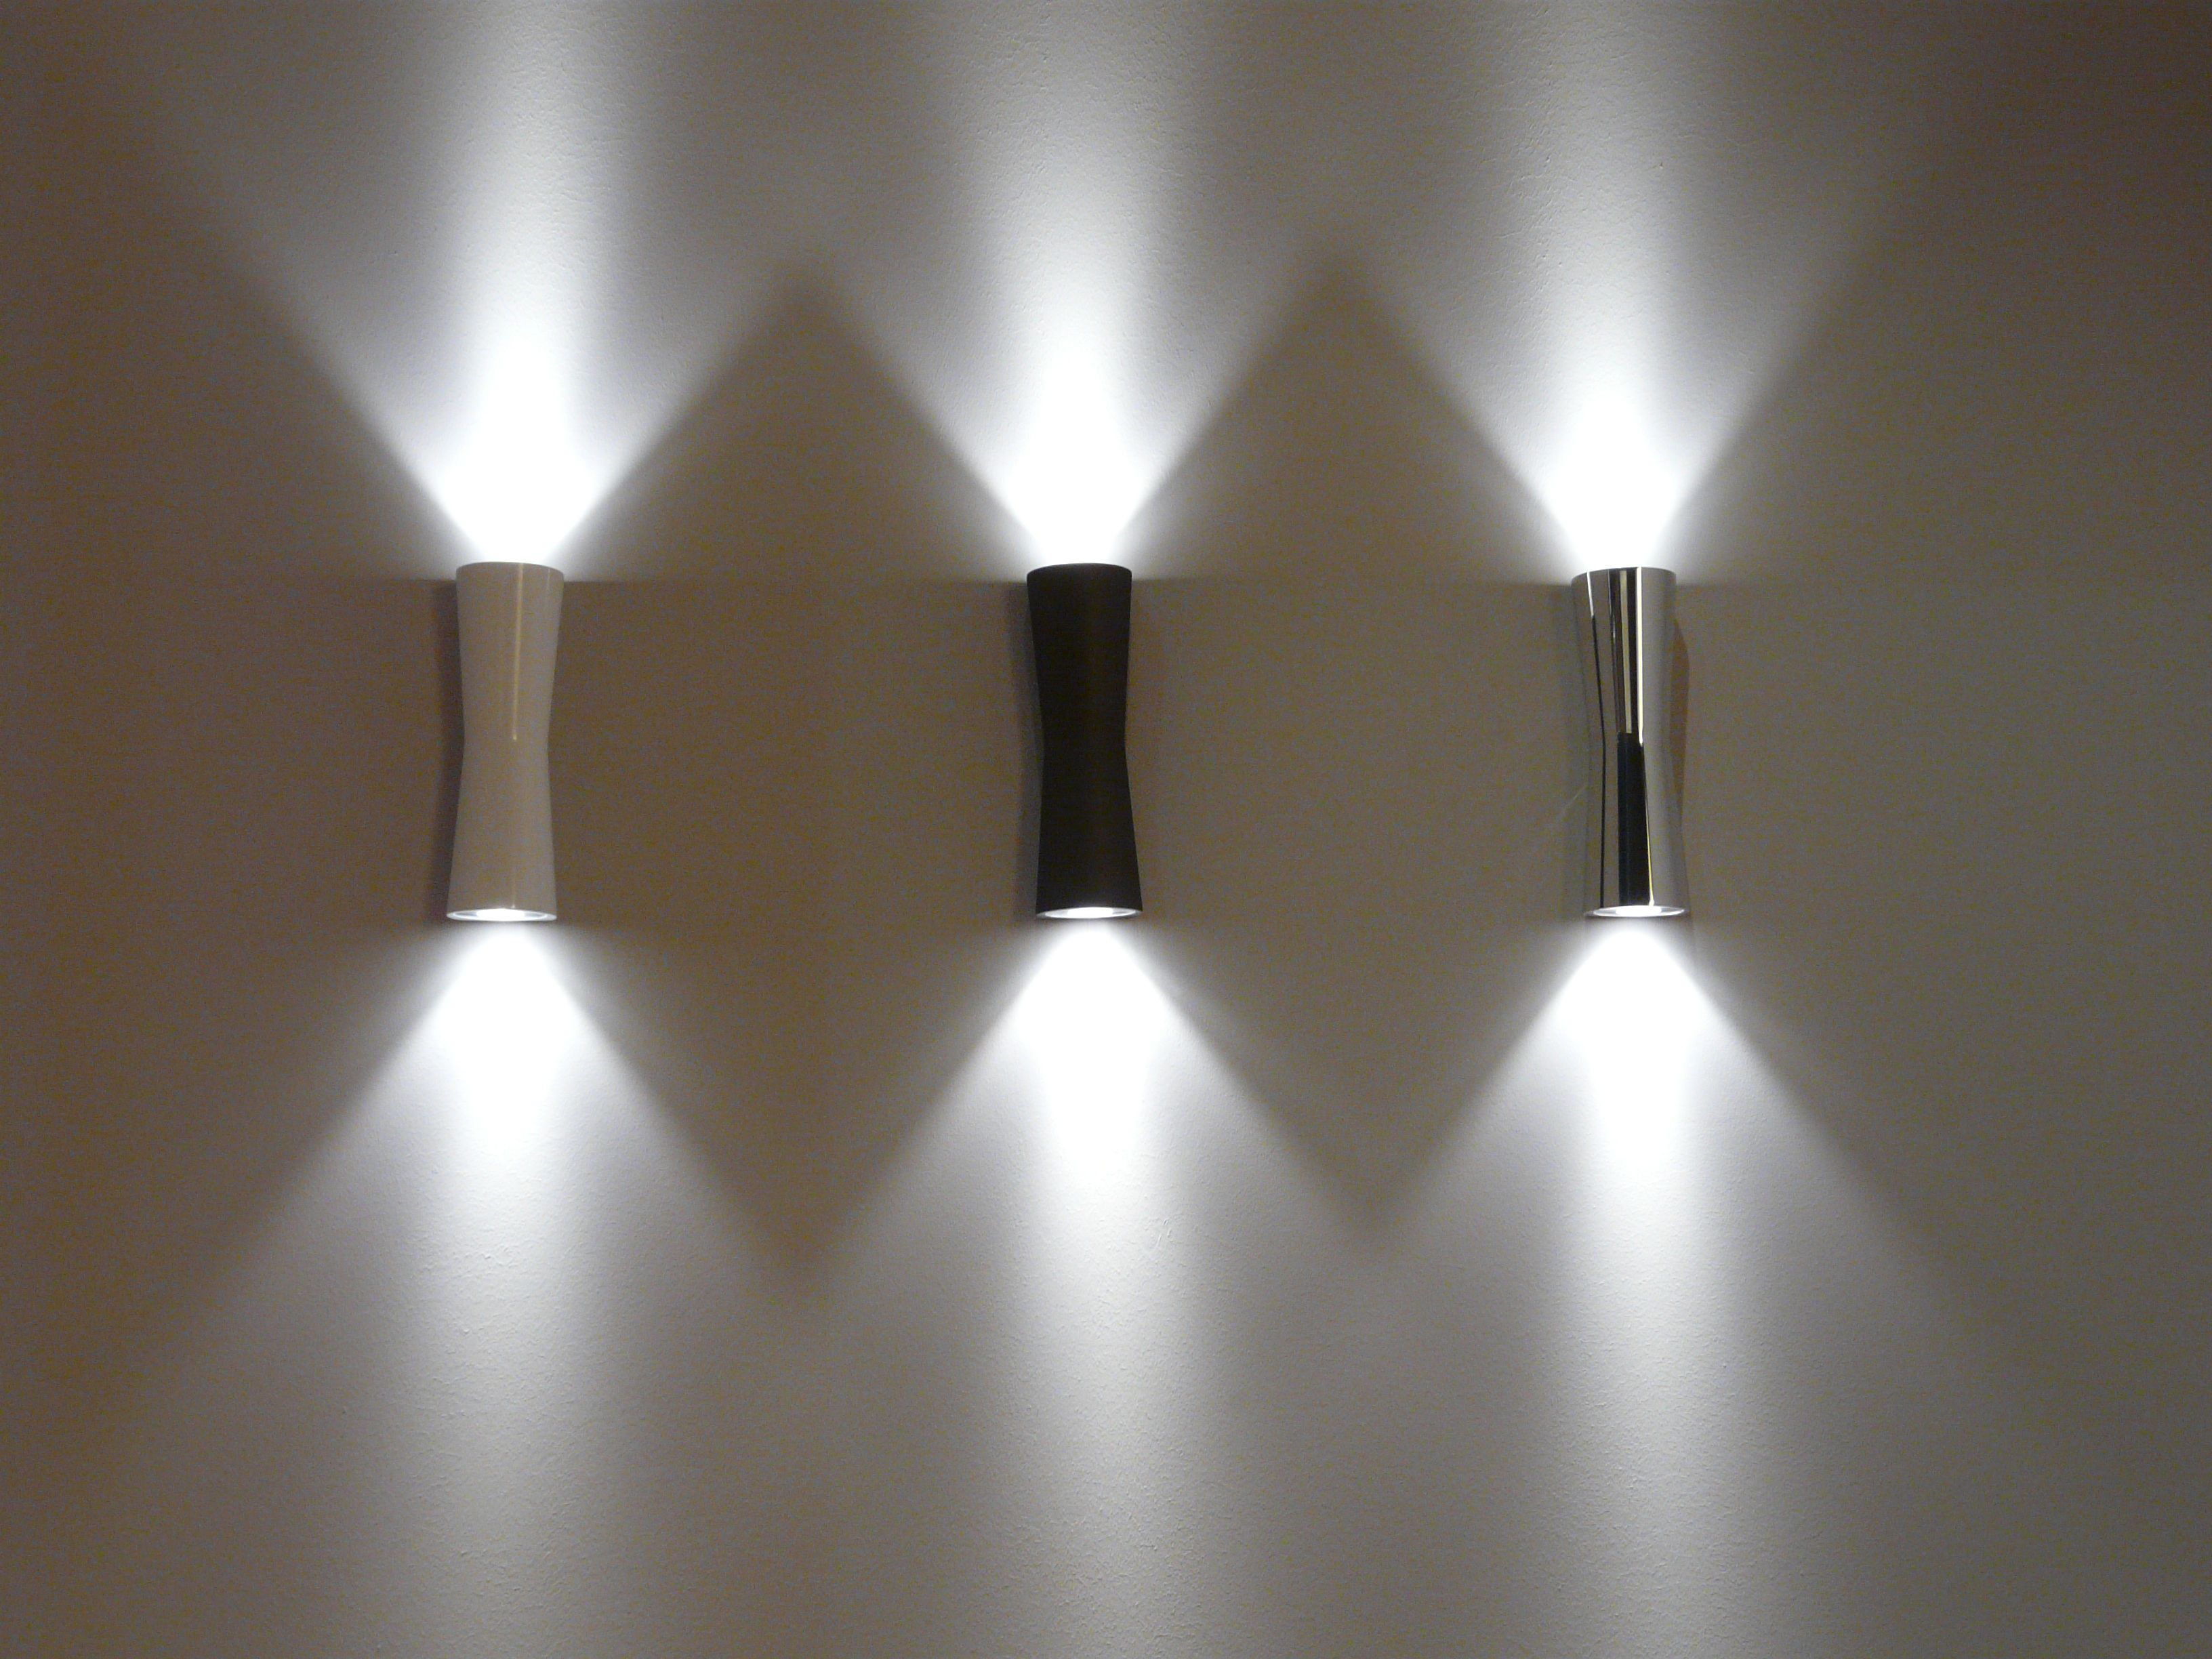 applique clessidra 20 led int rieur chrom flos made in design. Black Bedroom Furniture Sets. Home Design Ideas